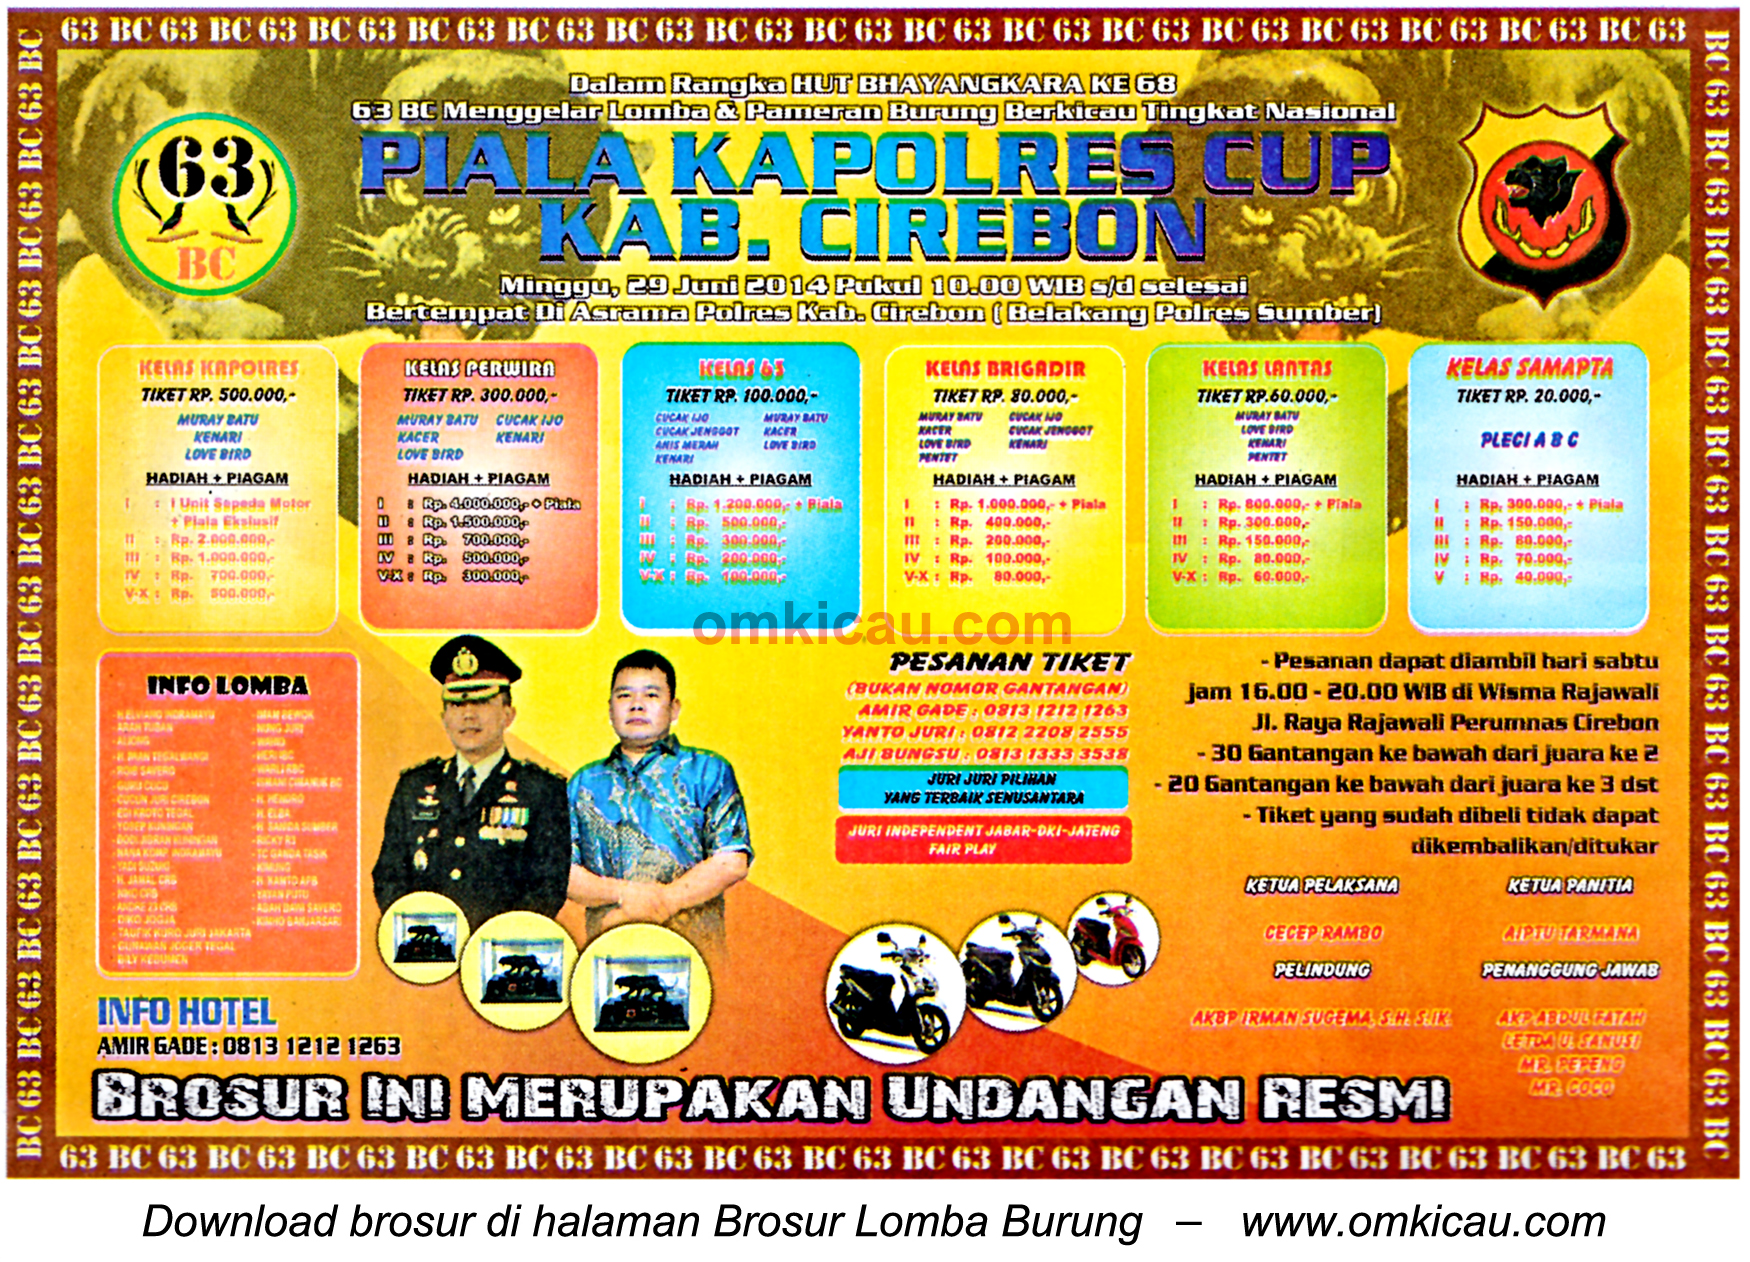 Brosur Lomba Burung Berkicau Kapolres Cup, Kabupaten Cirebon, 29 Juni 2014